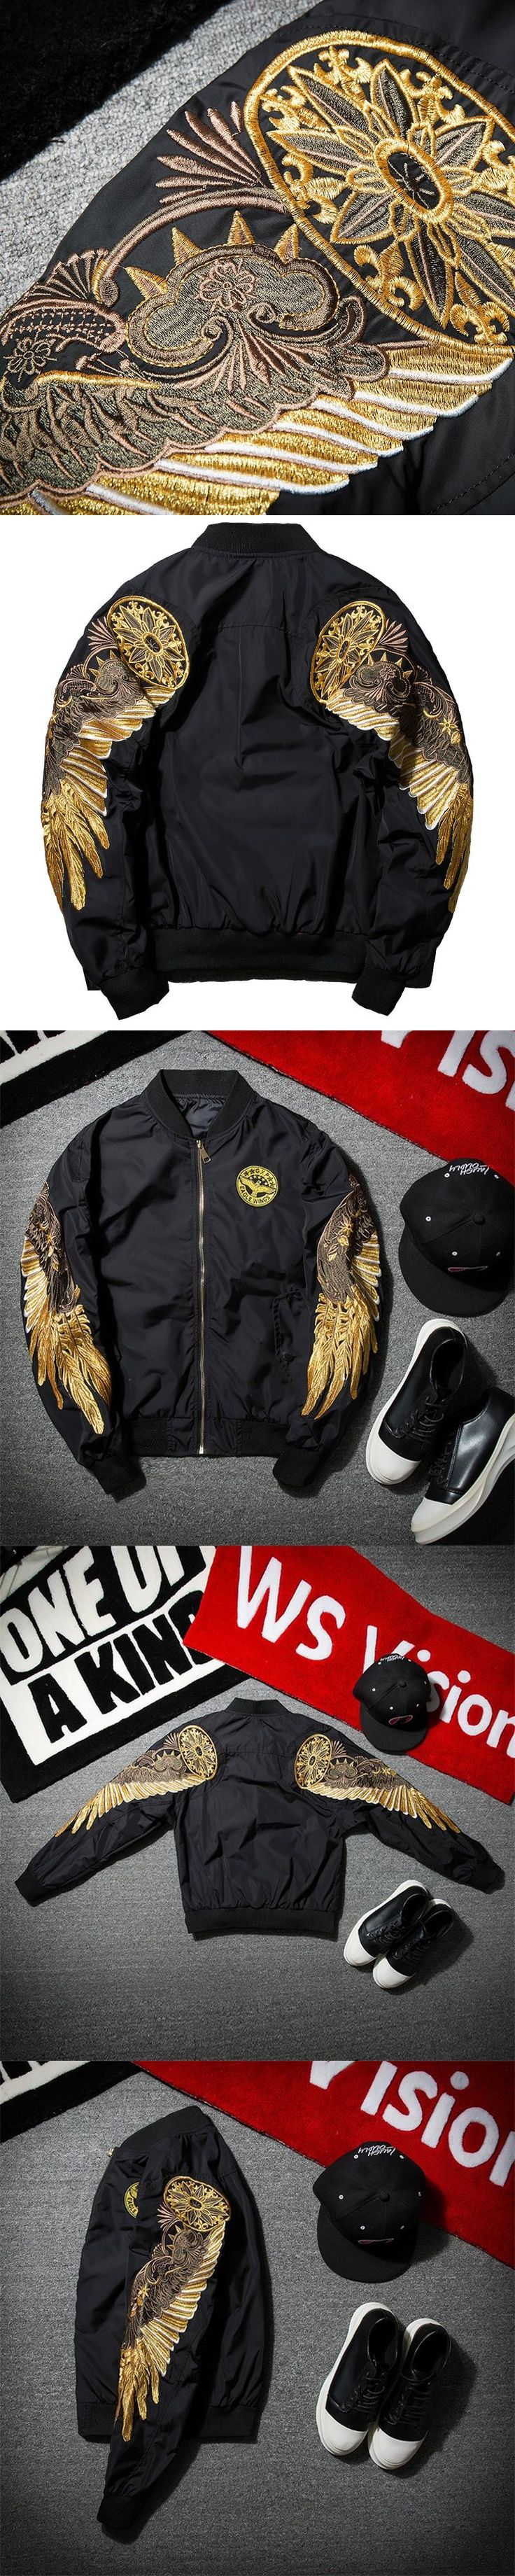 AmberHeard 2017 Spring Autumn Men Jacket Streetwear Black Angel Wing Embroidery MA1 Bomber Jacket Mens Pilot Outerwear Coat